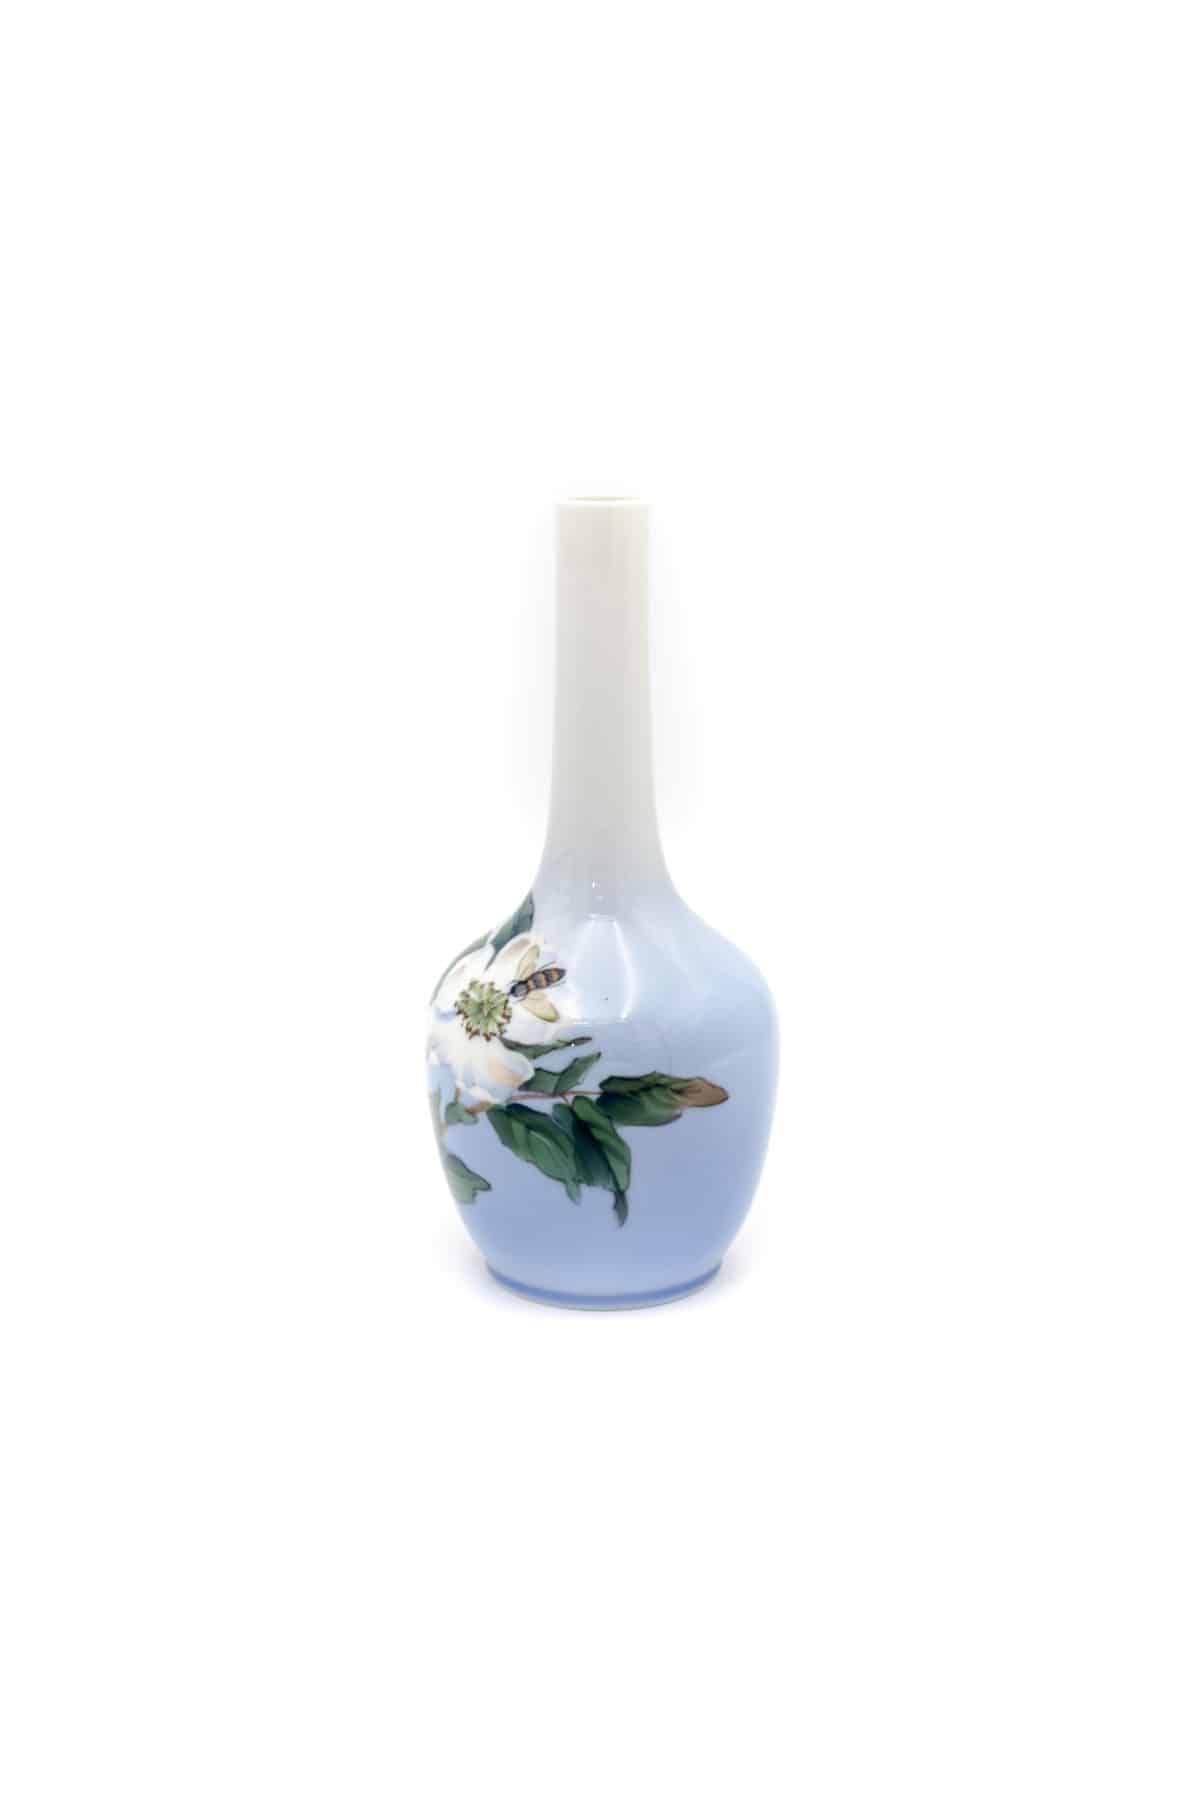 farforovaya vaza pchela na cvetke